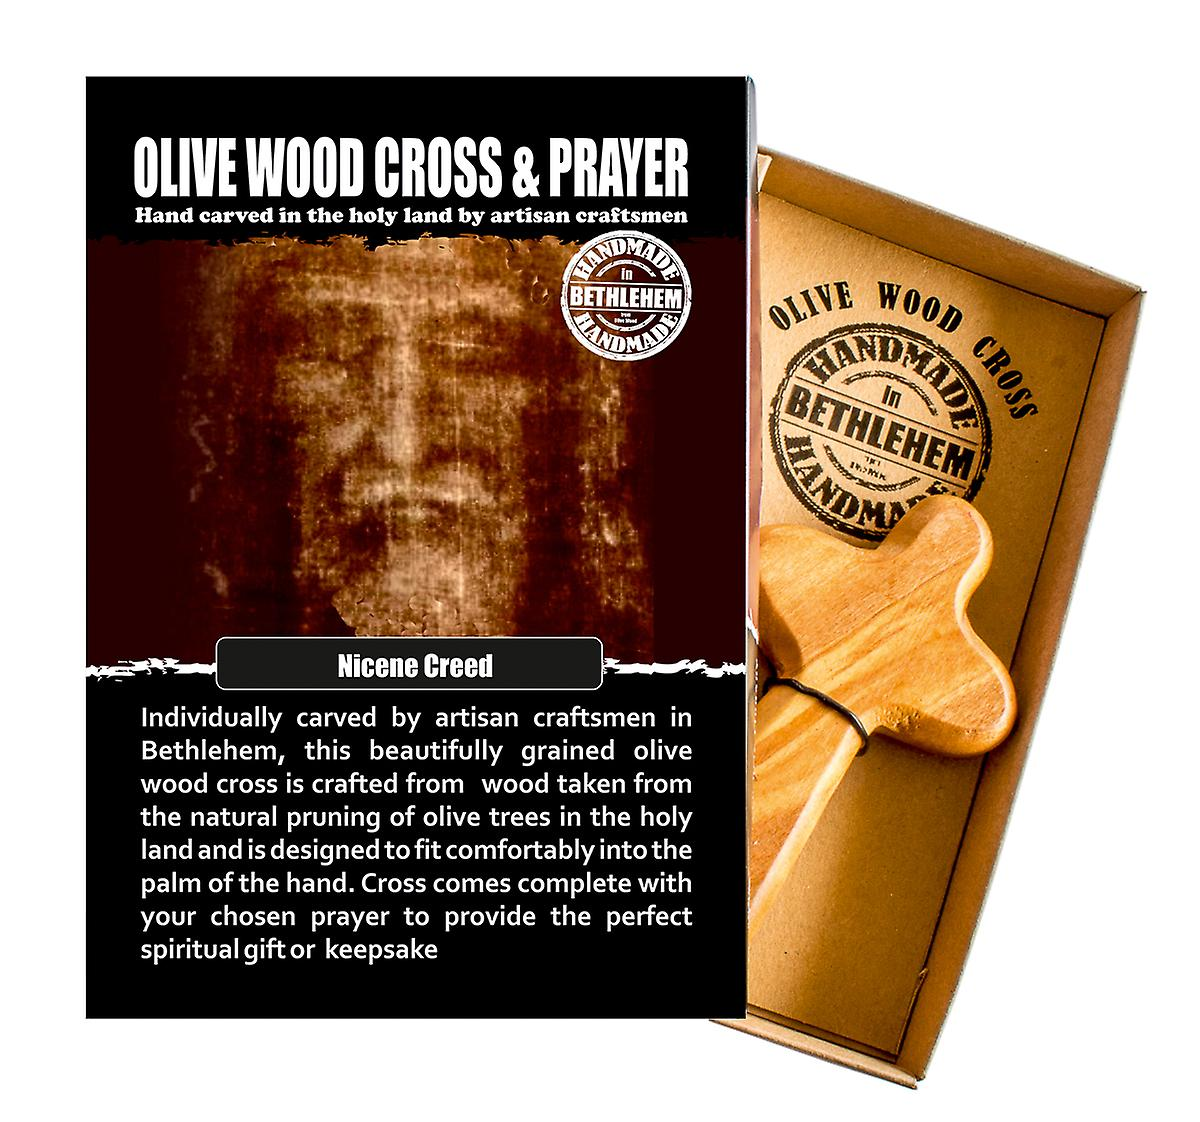 Nicene Creed Carved Olive Wood Comfort Cross Religious Keepsake Hand Made In Bethlehem